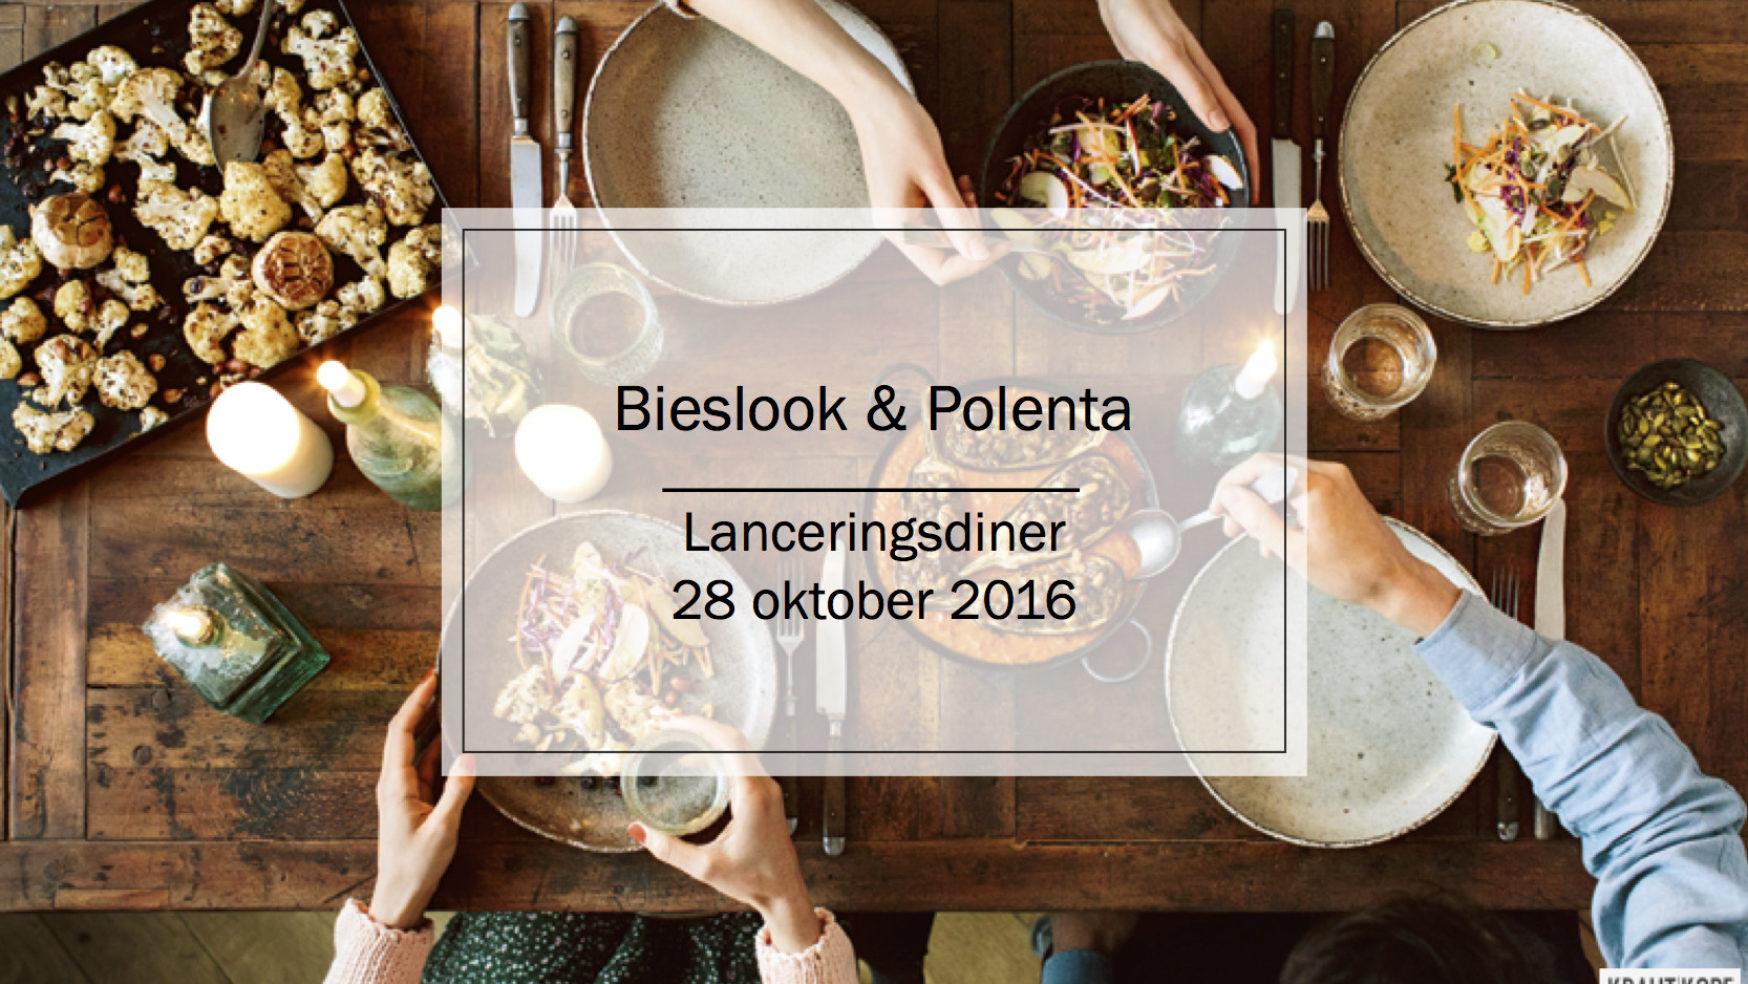 Bieslook & Polenta lanceringsdiner